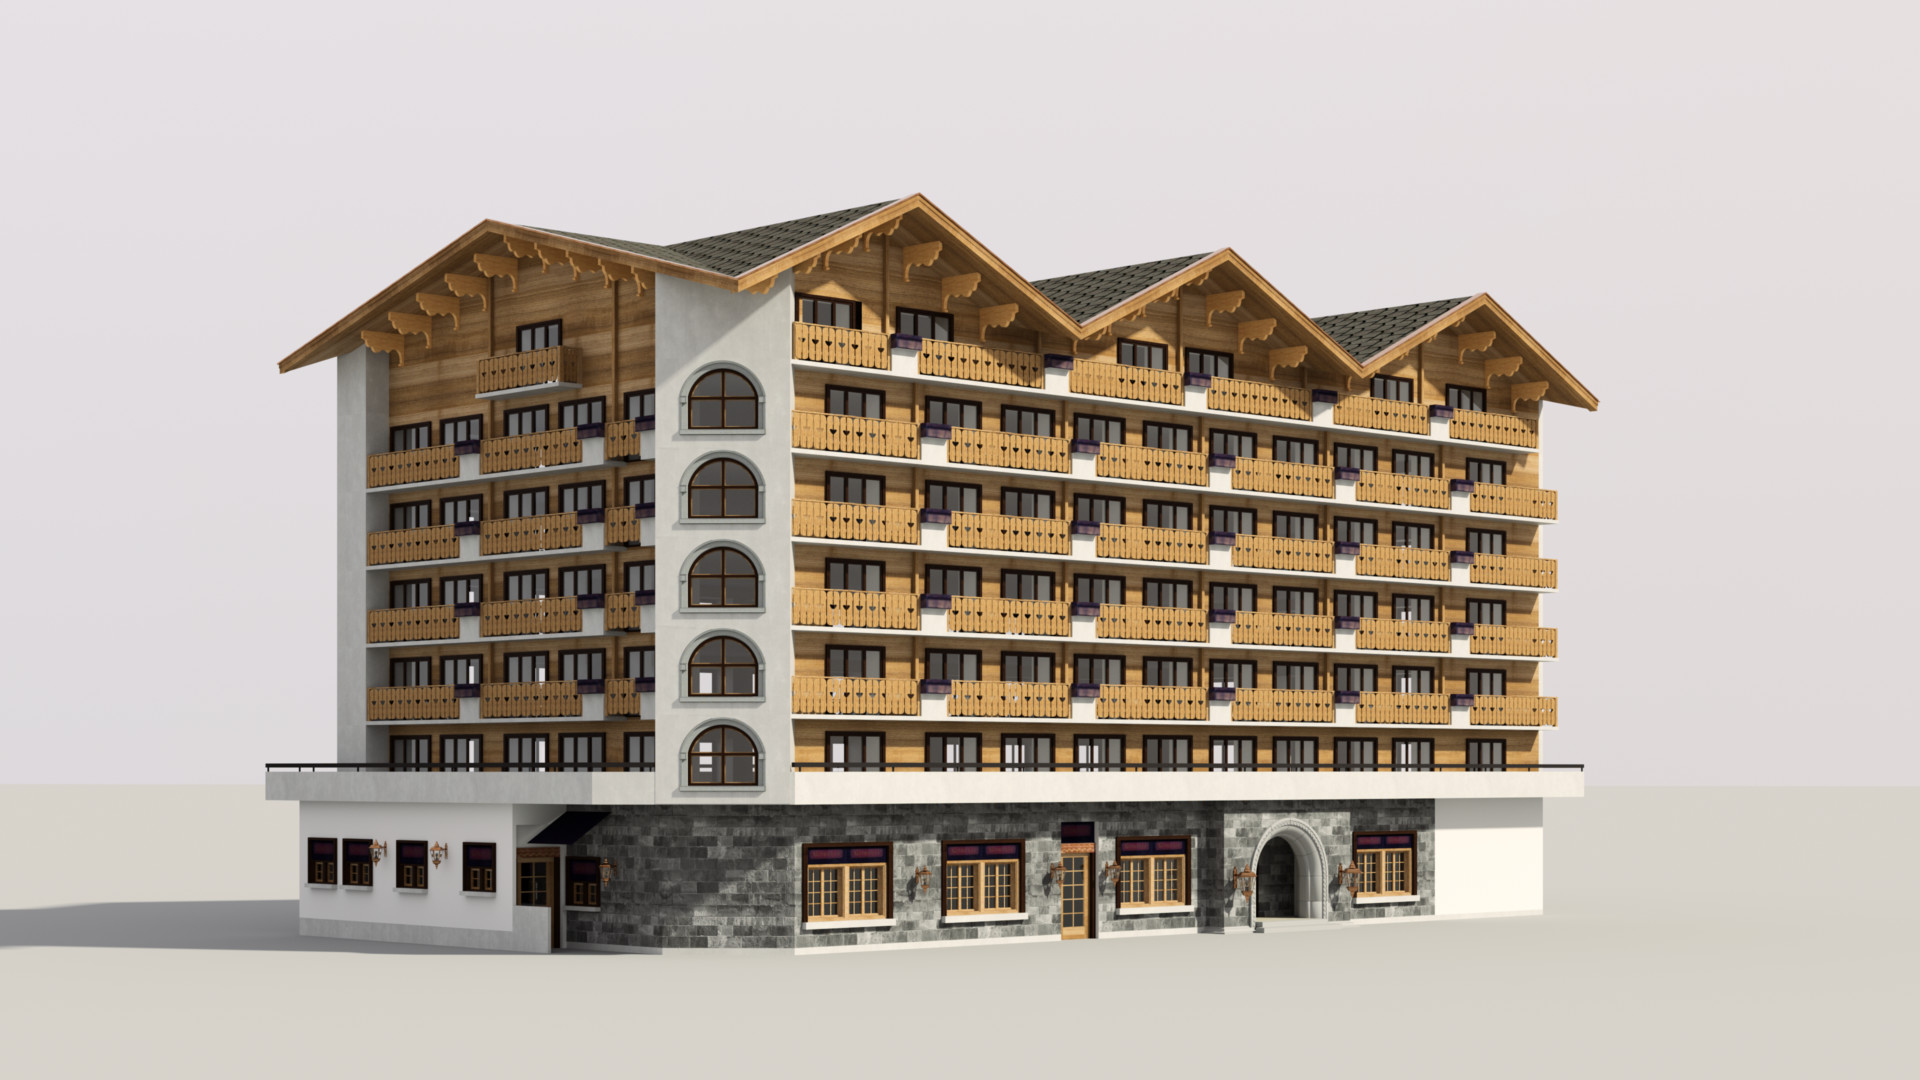 Duane kemp alpine hotel ppe scene 2